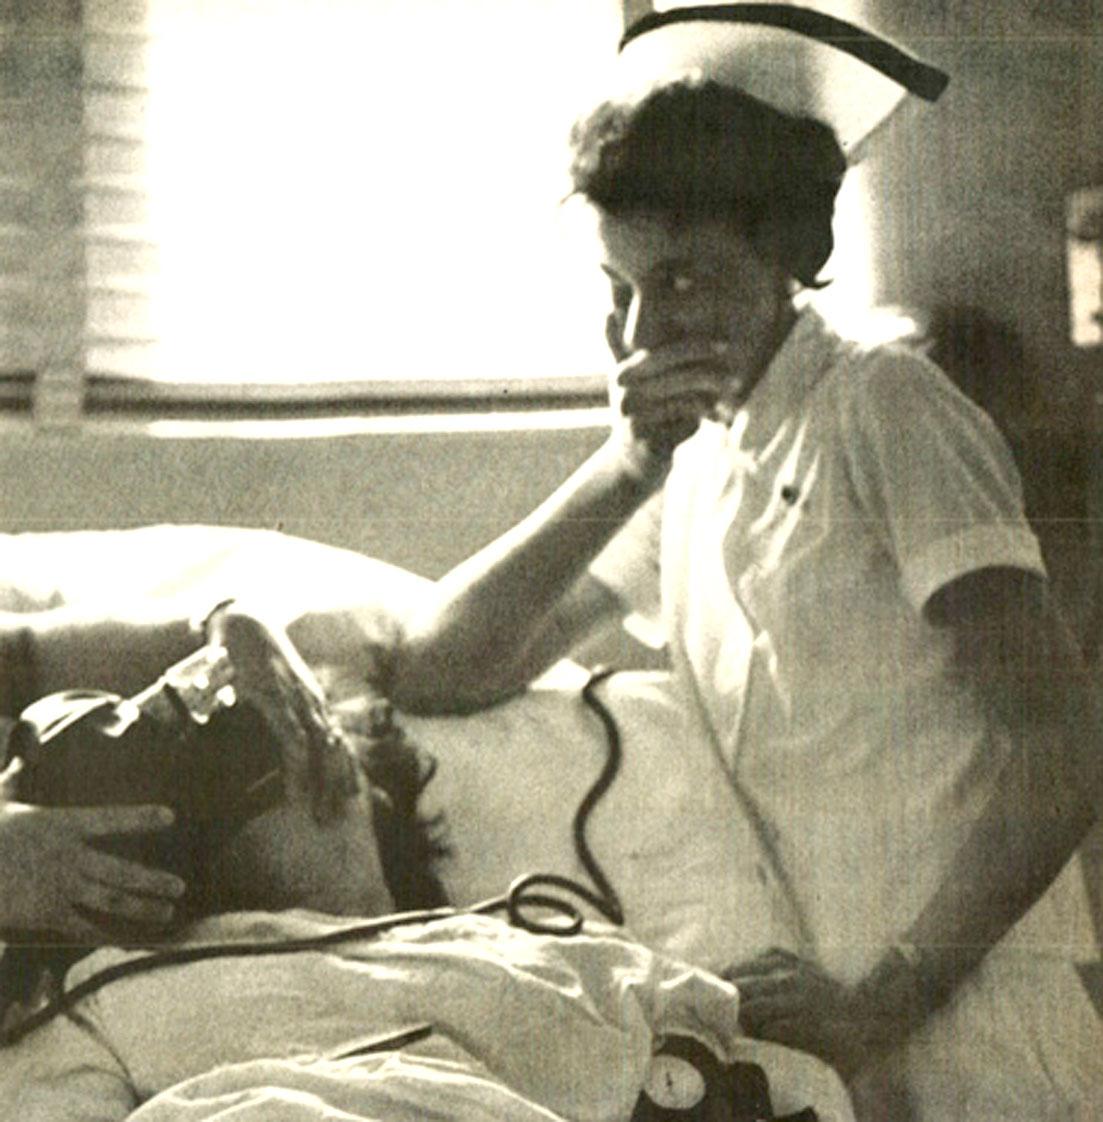 Hospital 1940s